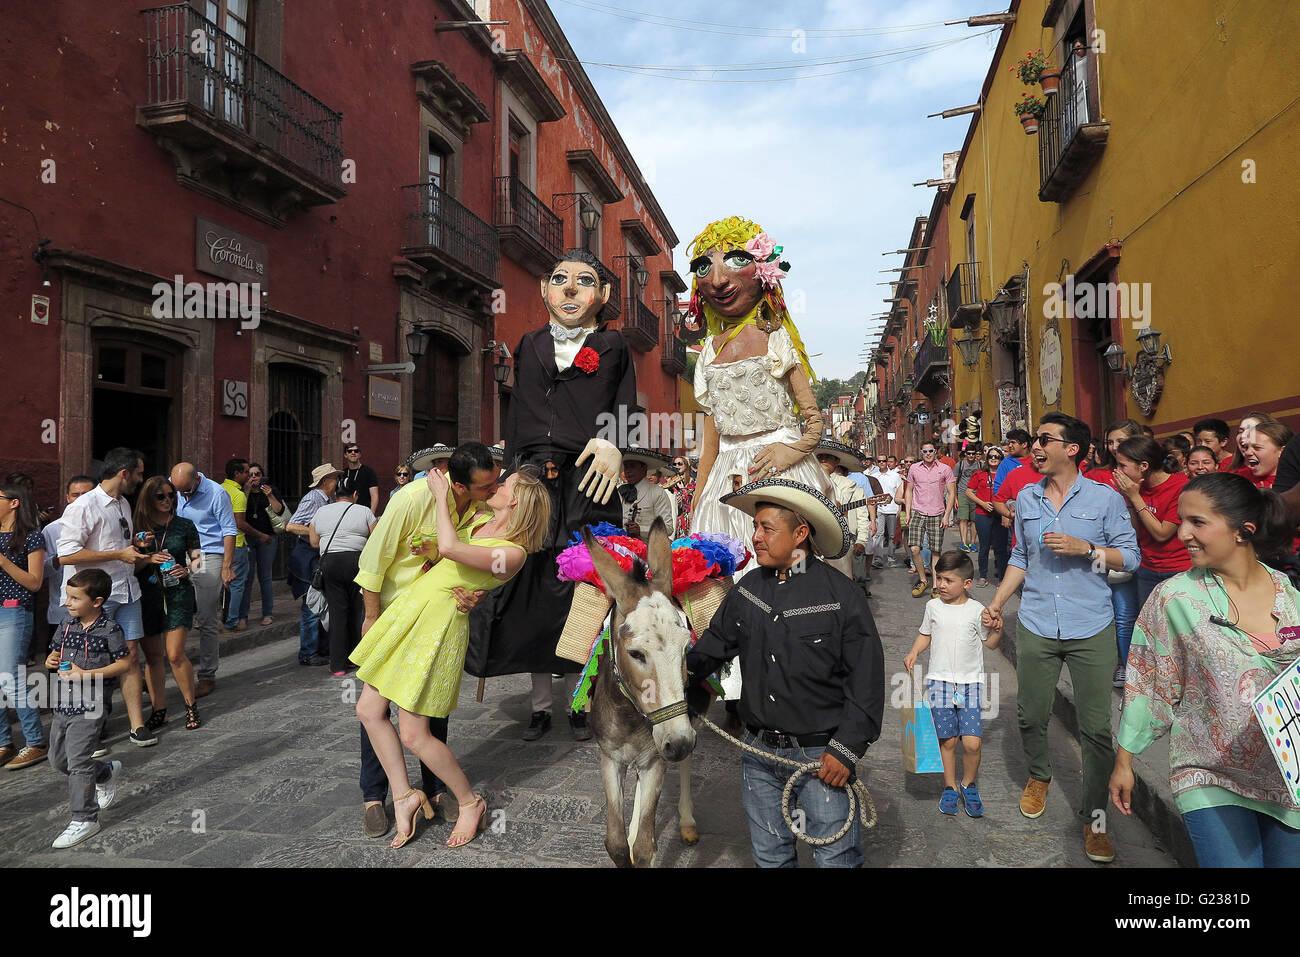 San Miguel De Allende, Mexico. 18th Apr, 2016. A couple kisses during a wedding parade through the streets in San - Stock Image